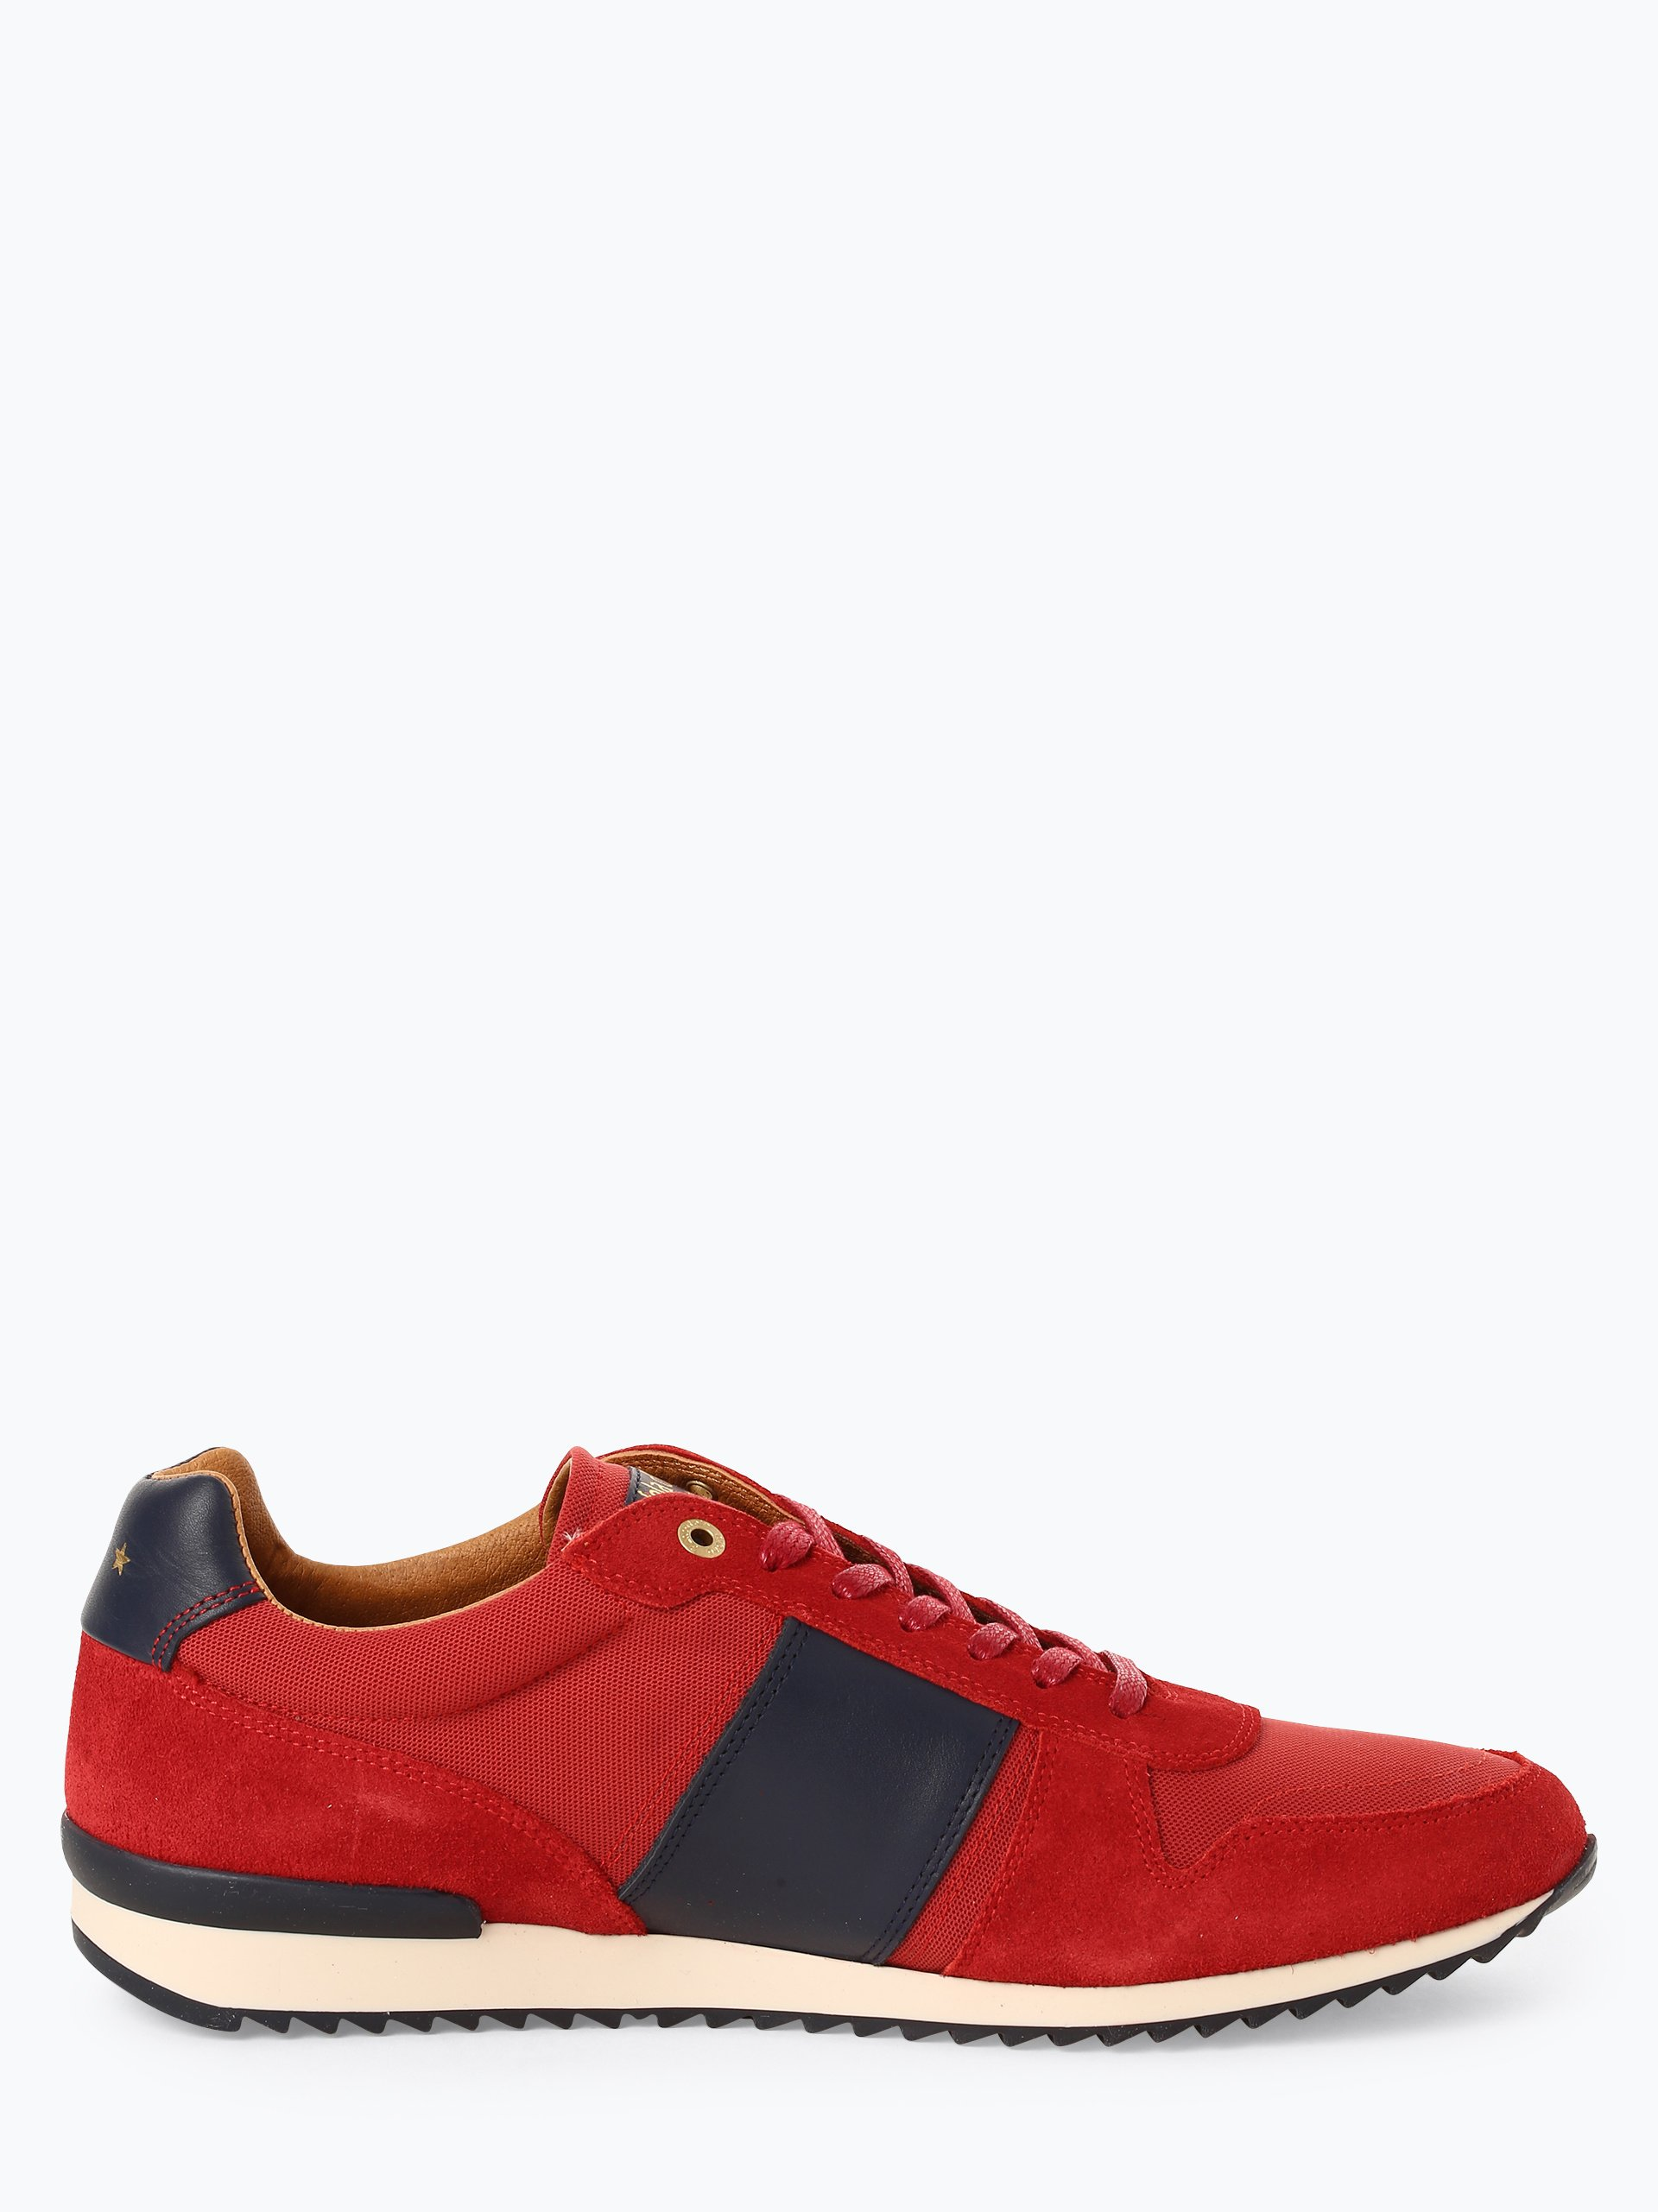 Pantofola d\'Oro Tenisówki męskie z dodatkiem skóry – Umito